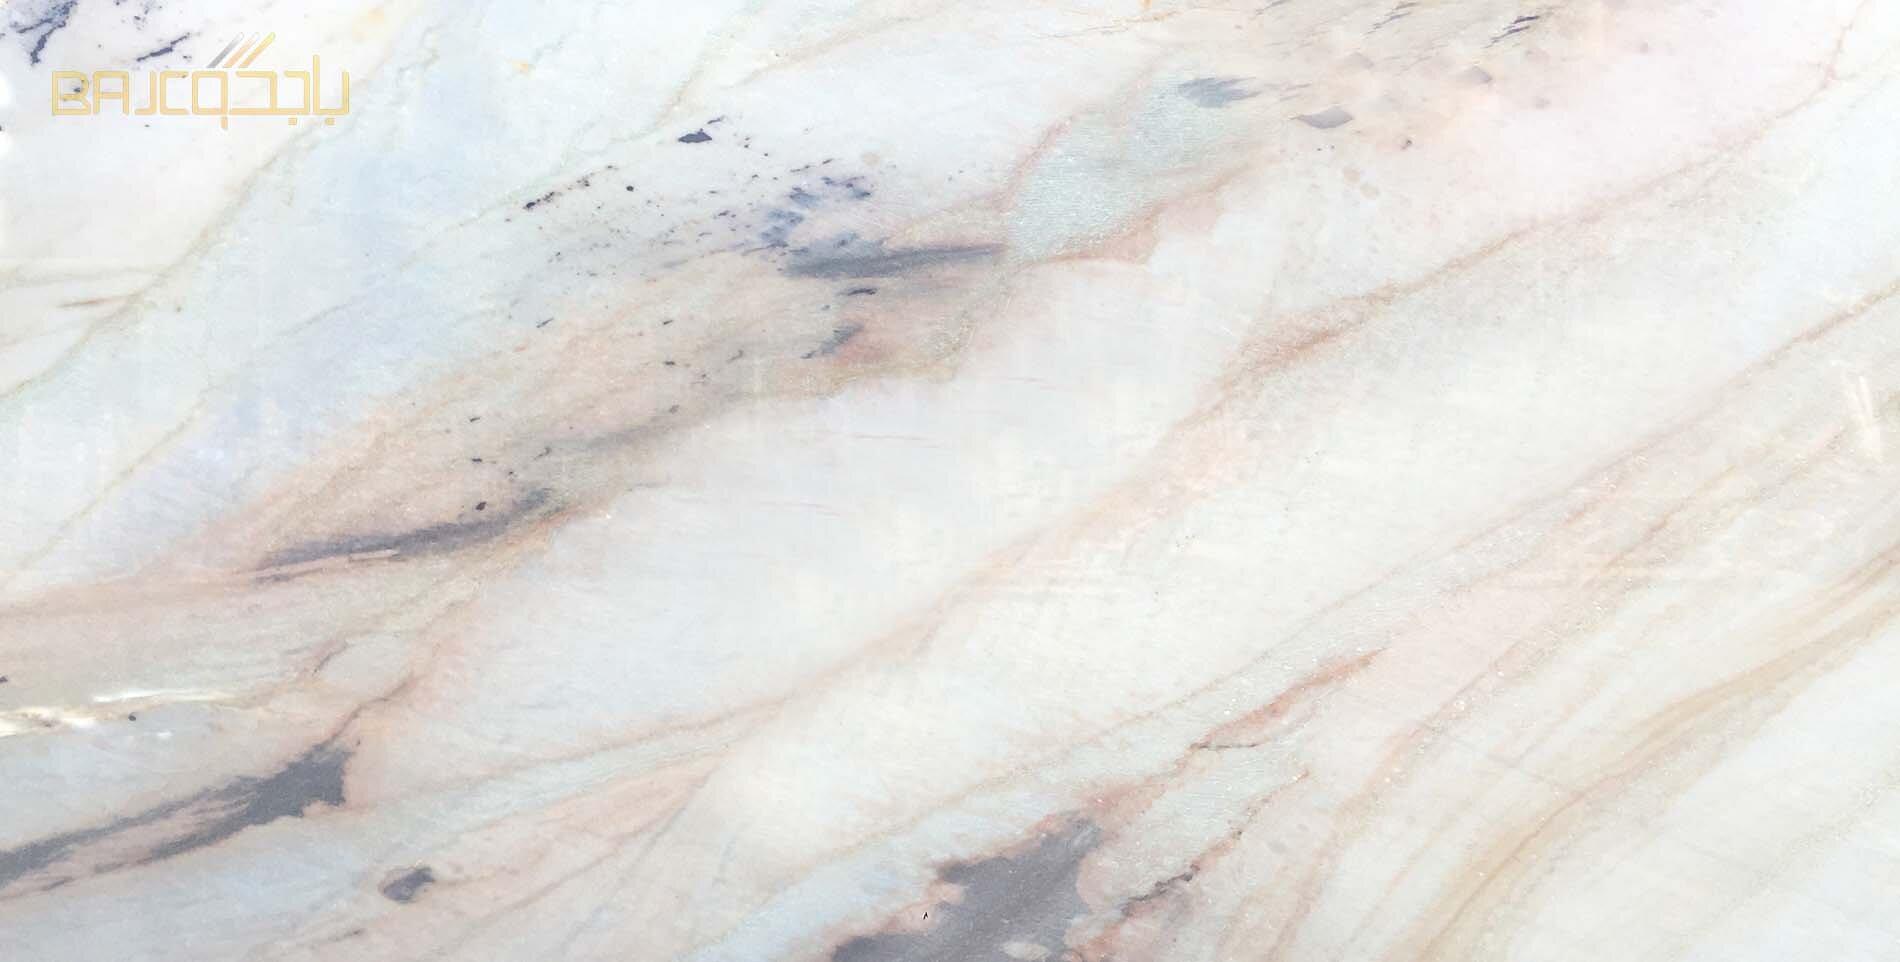 Desert-Eagle-ديزيرتايجل